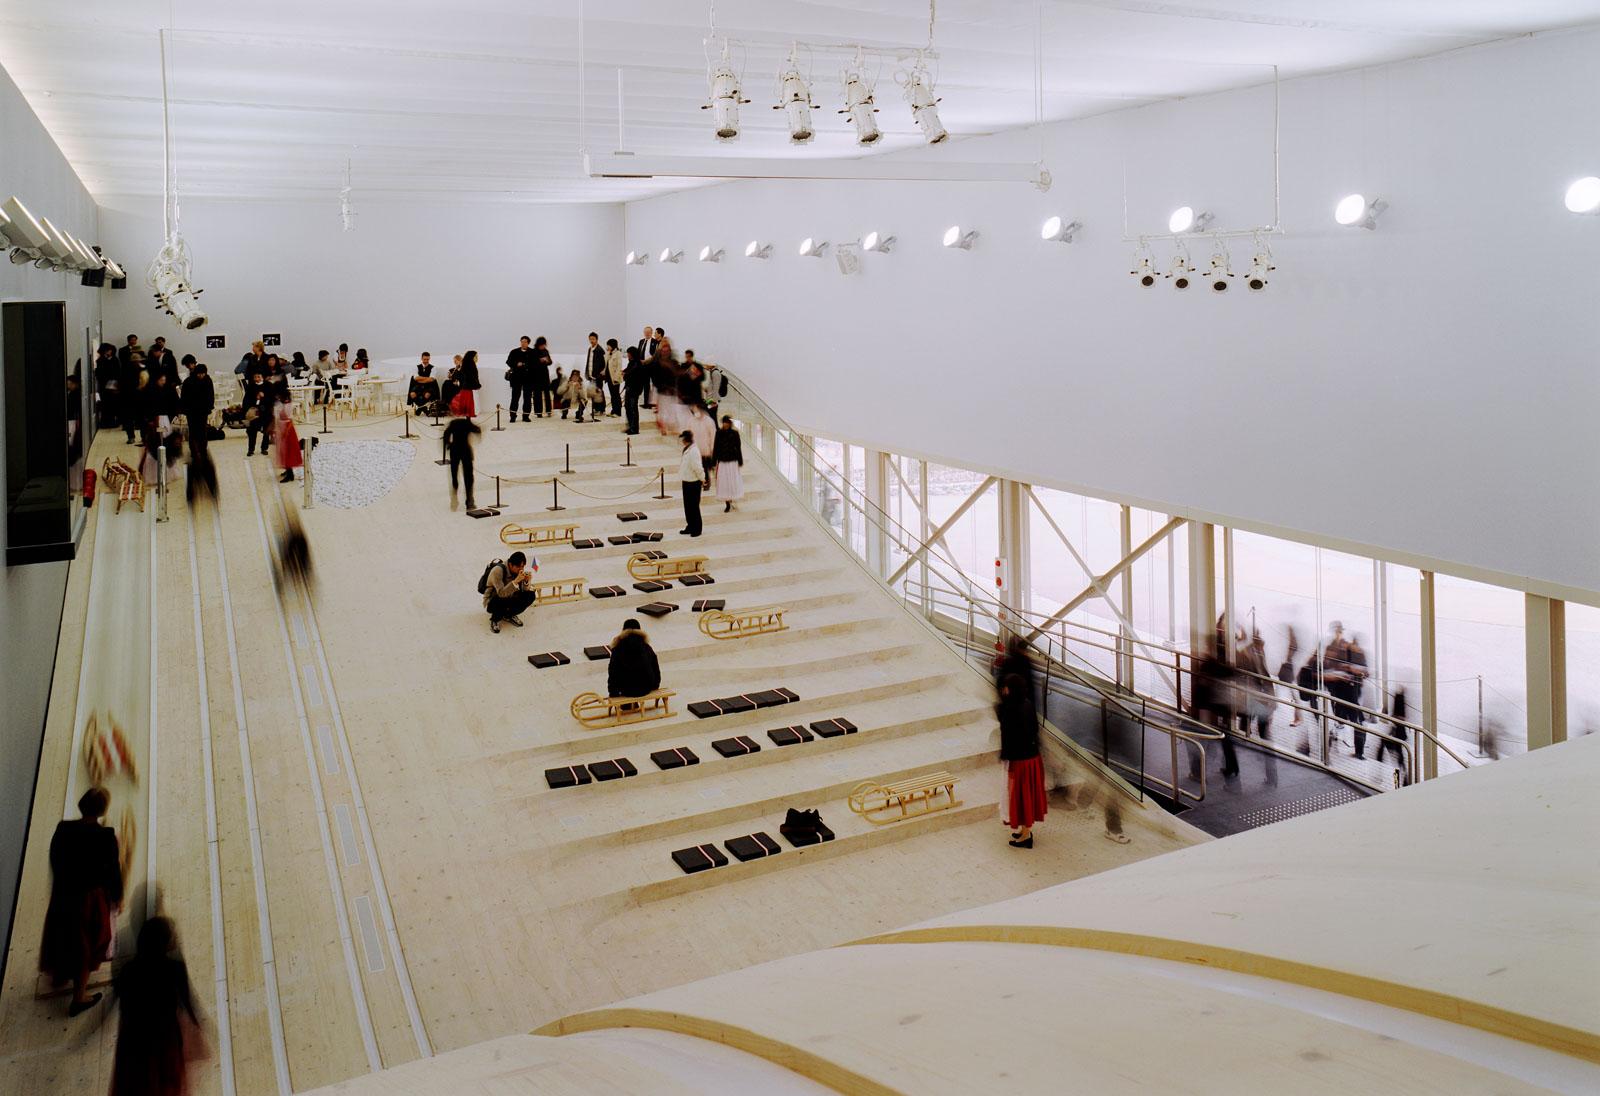 World Expo Aichi Austrian pavilion